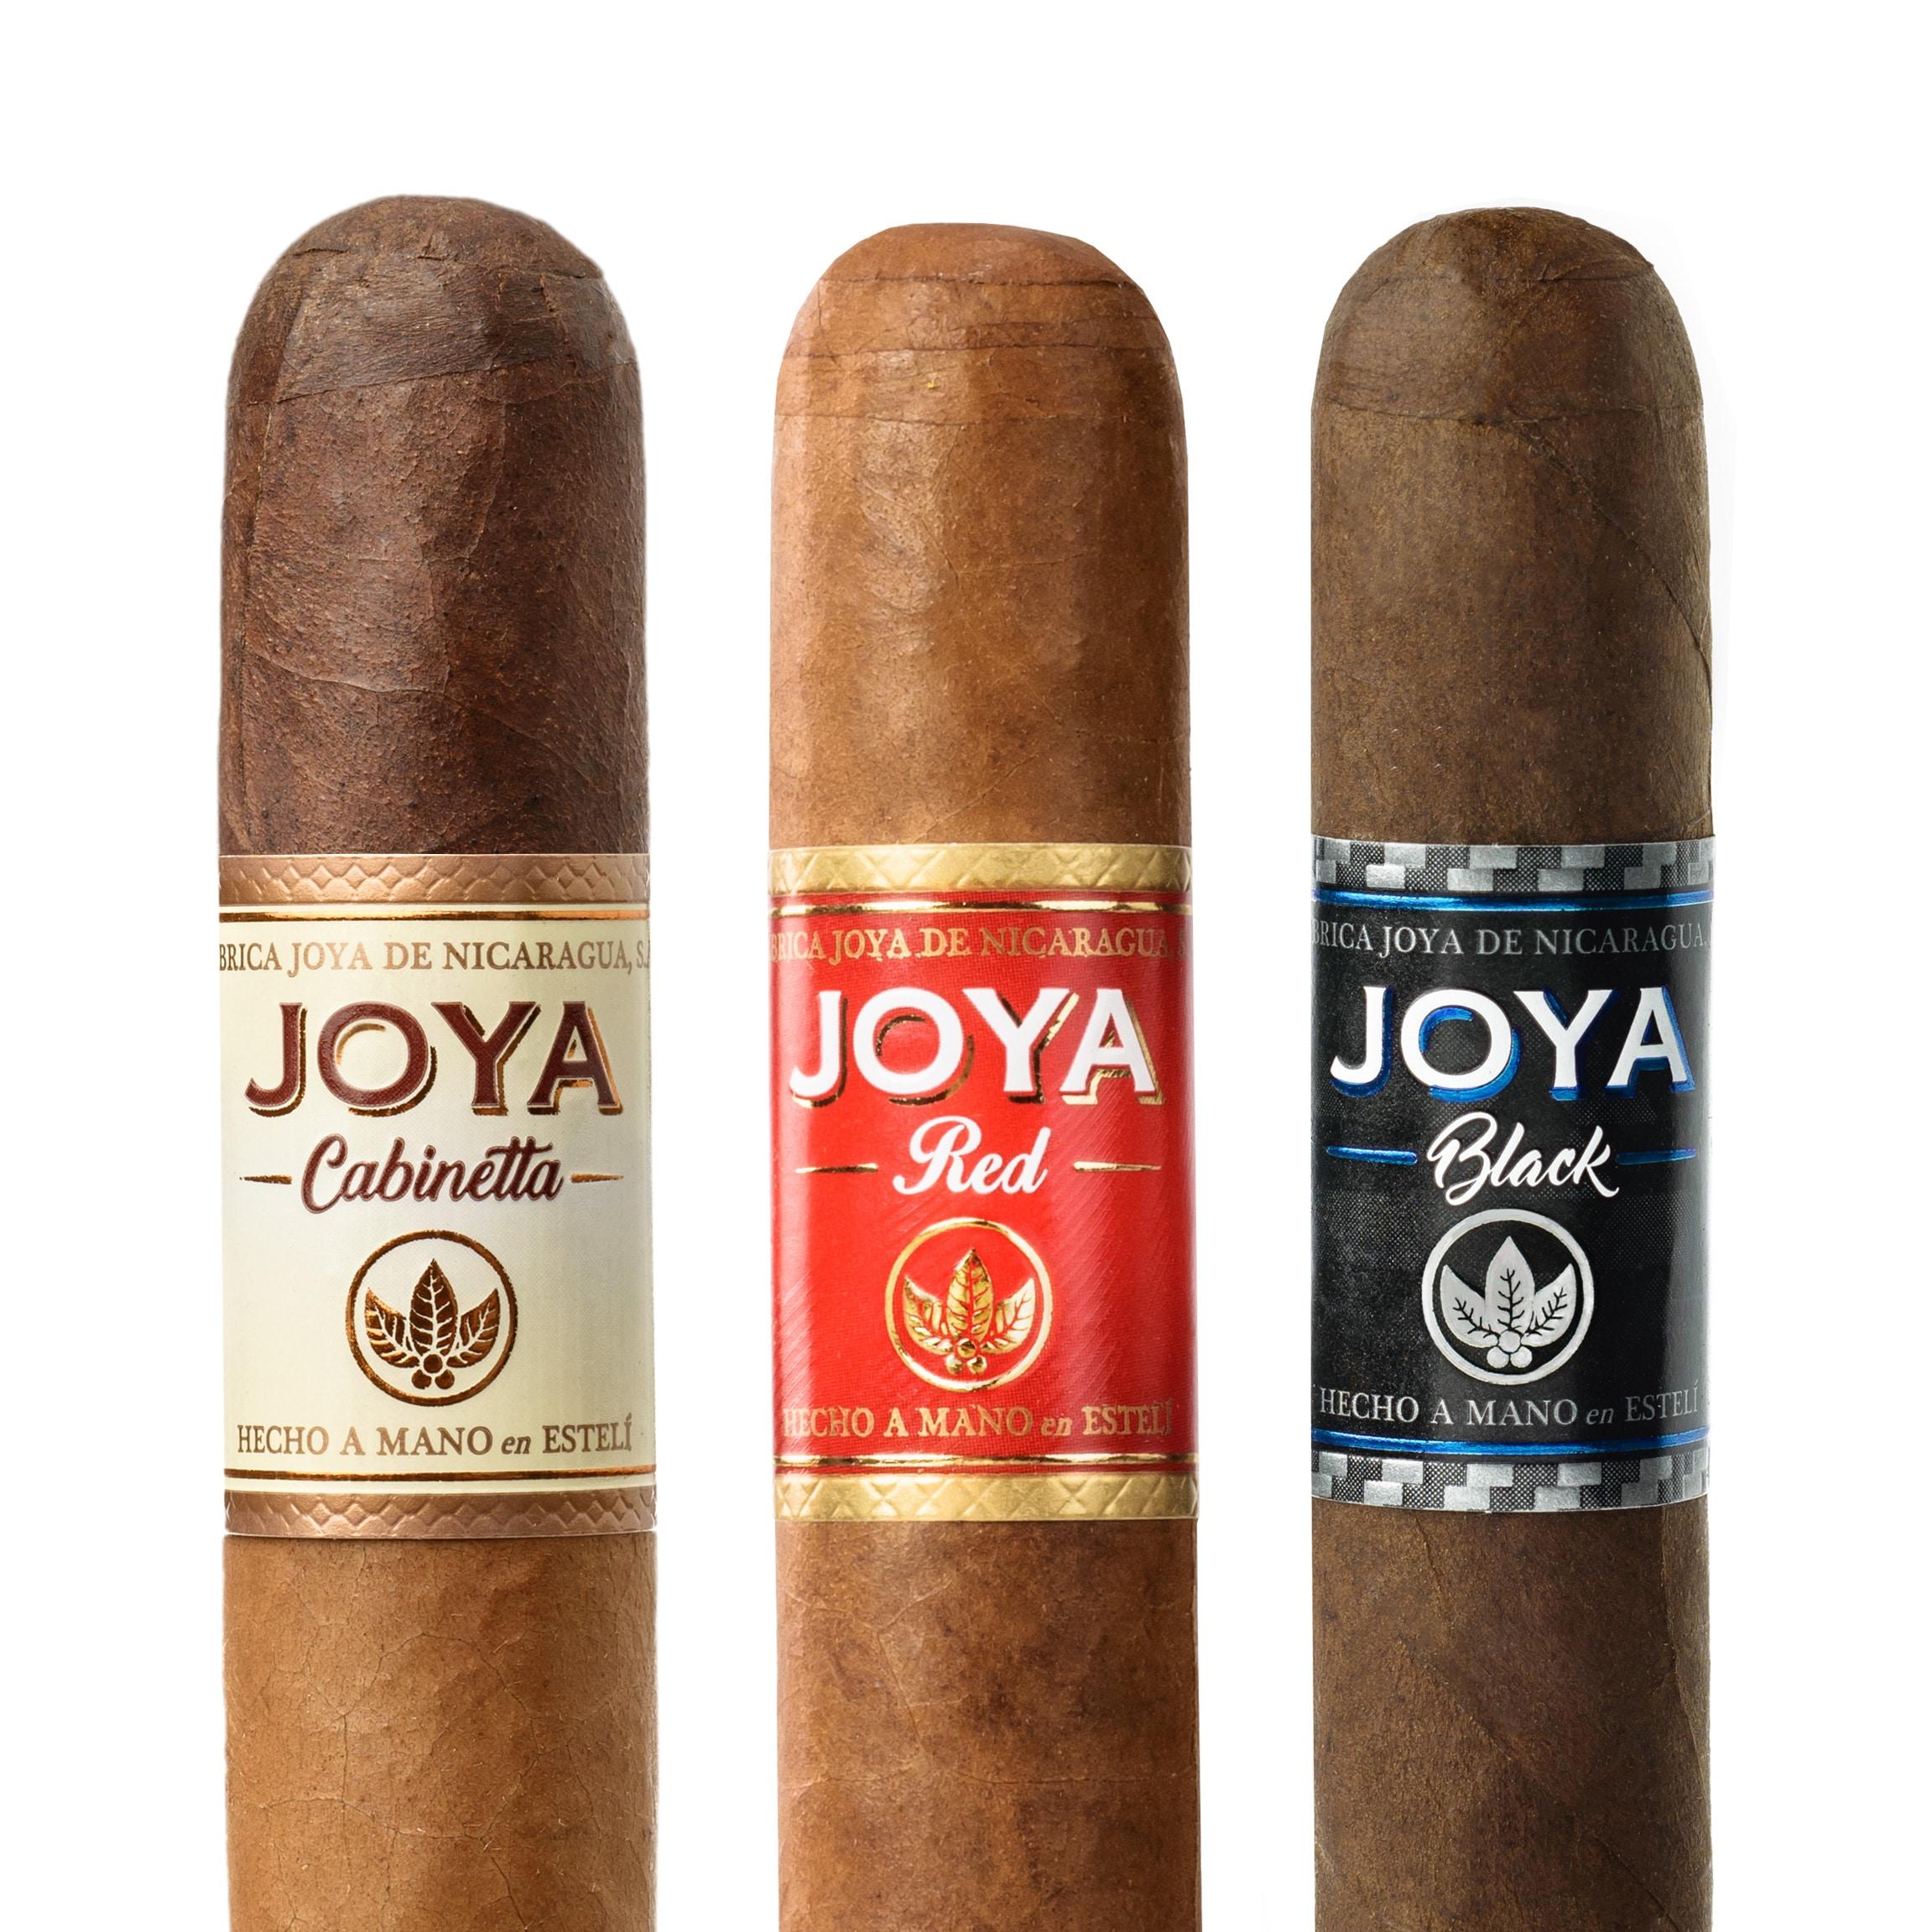 Joya de Nicaragua JOYA cigar lineup